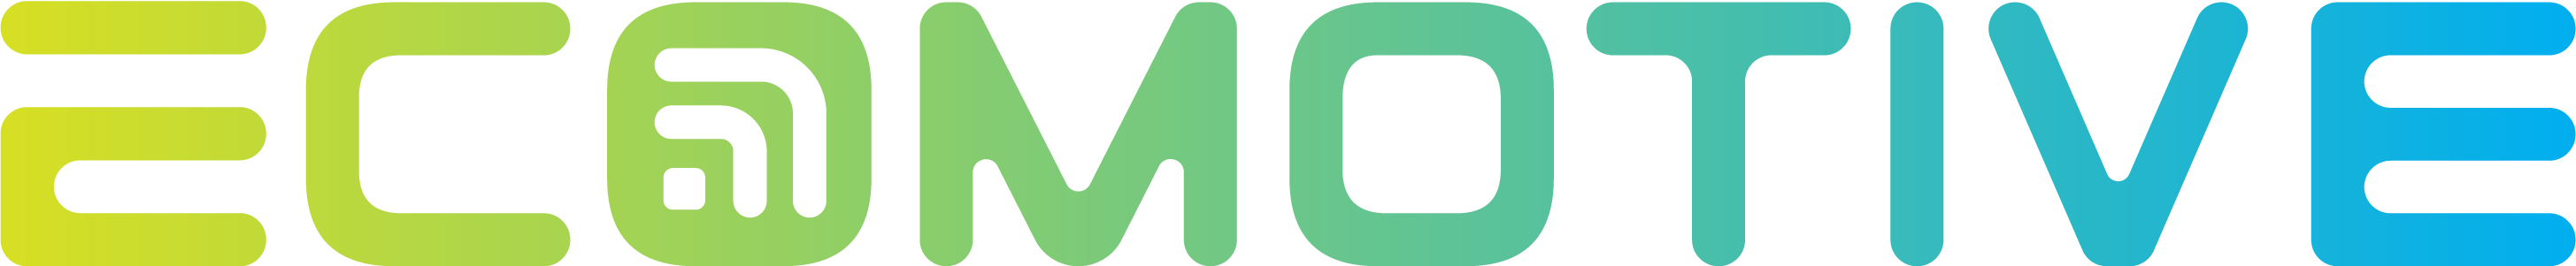 لوگوی اکوموتیو